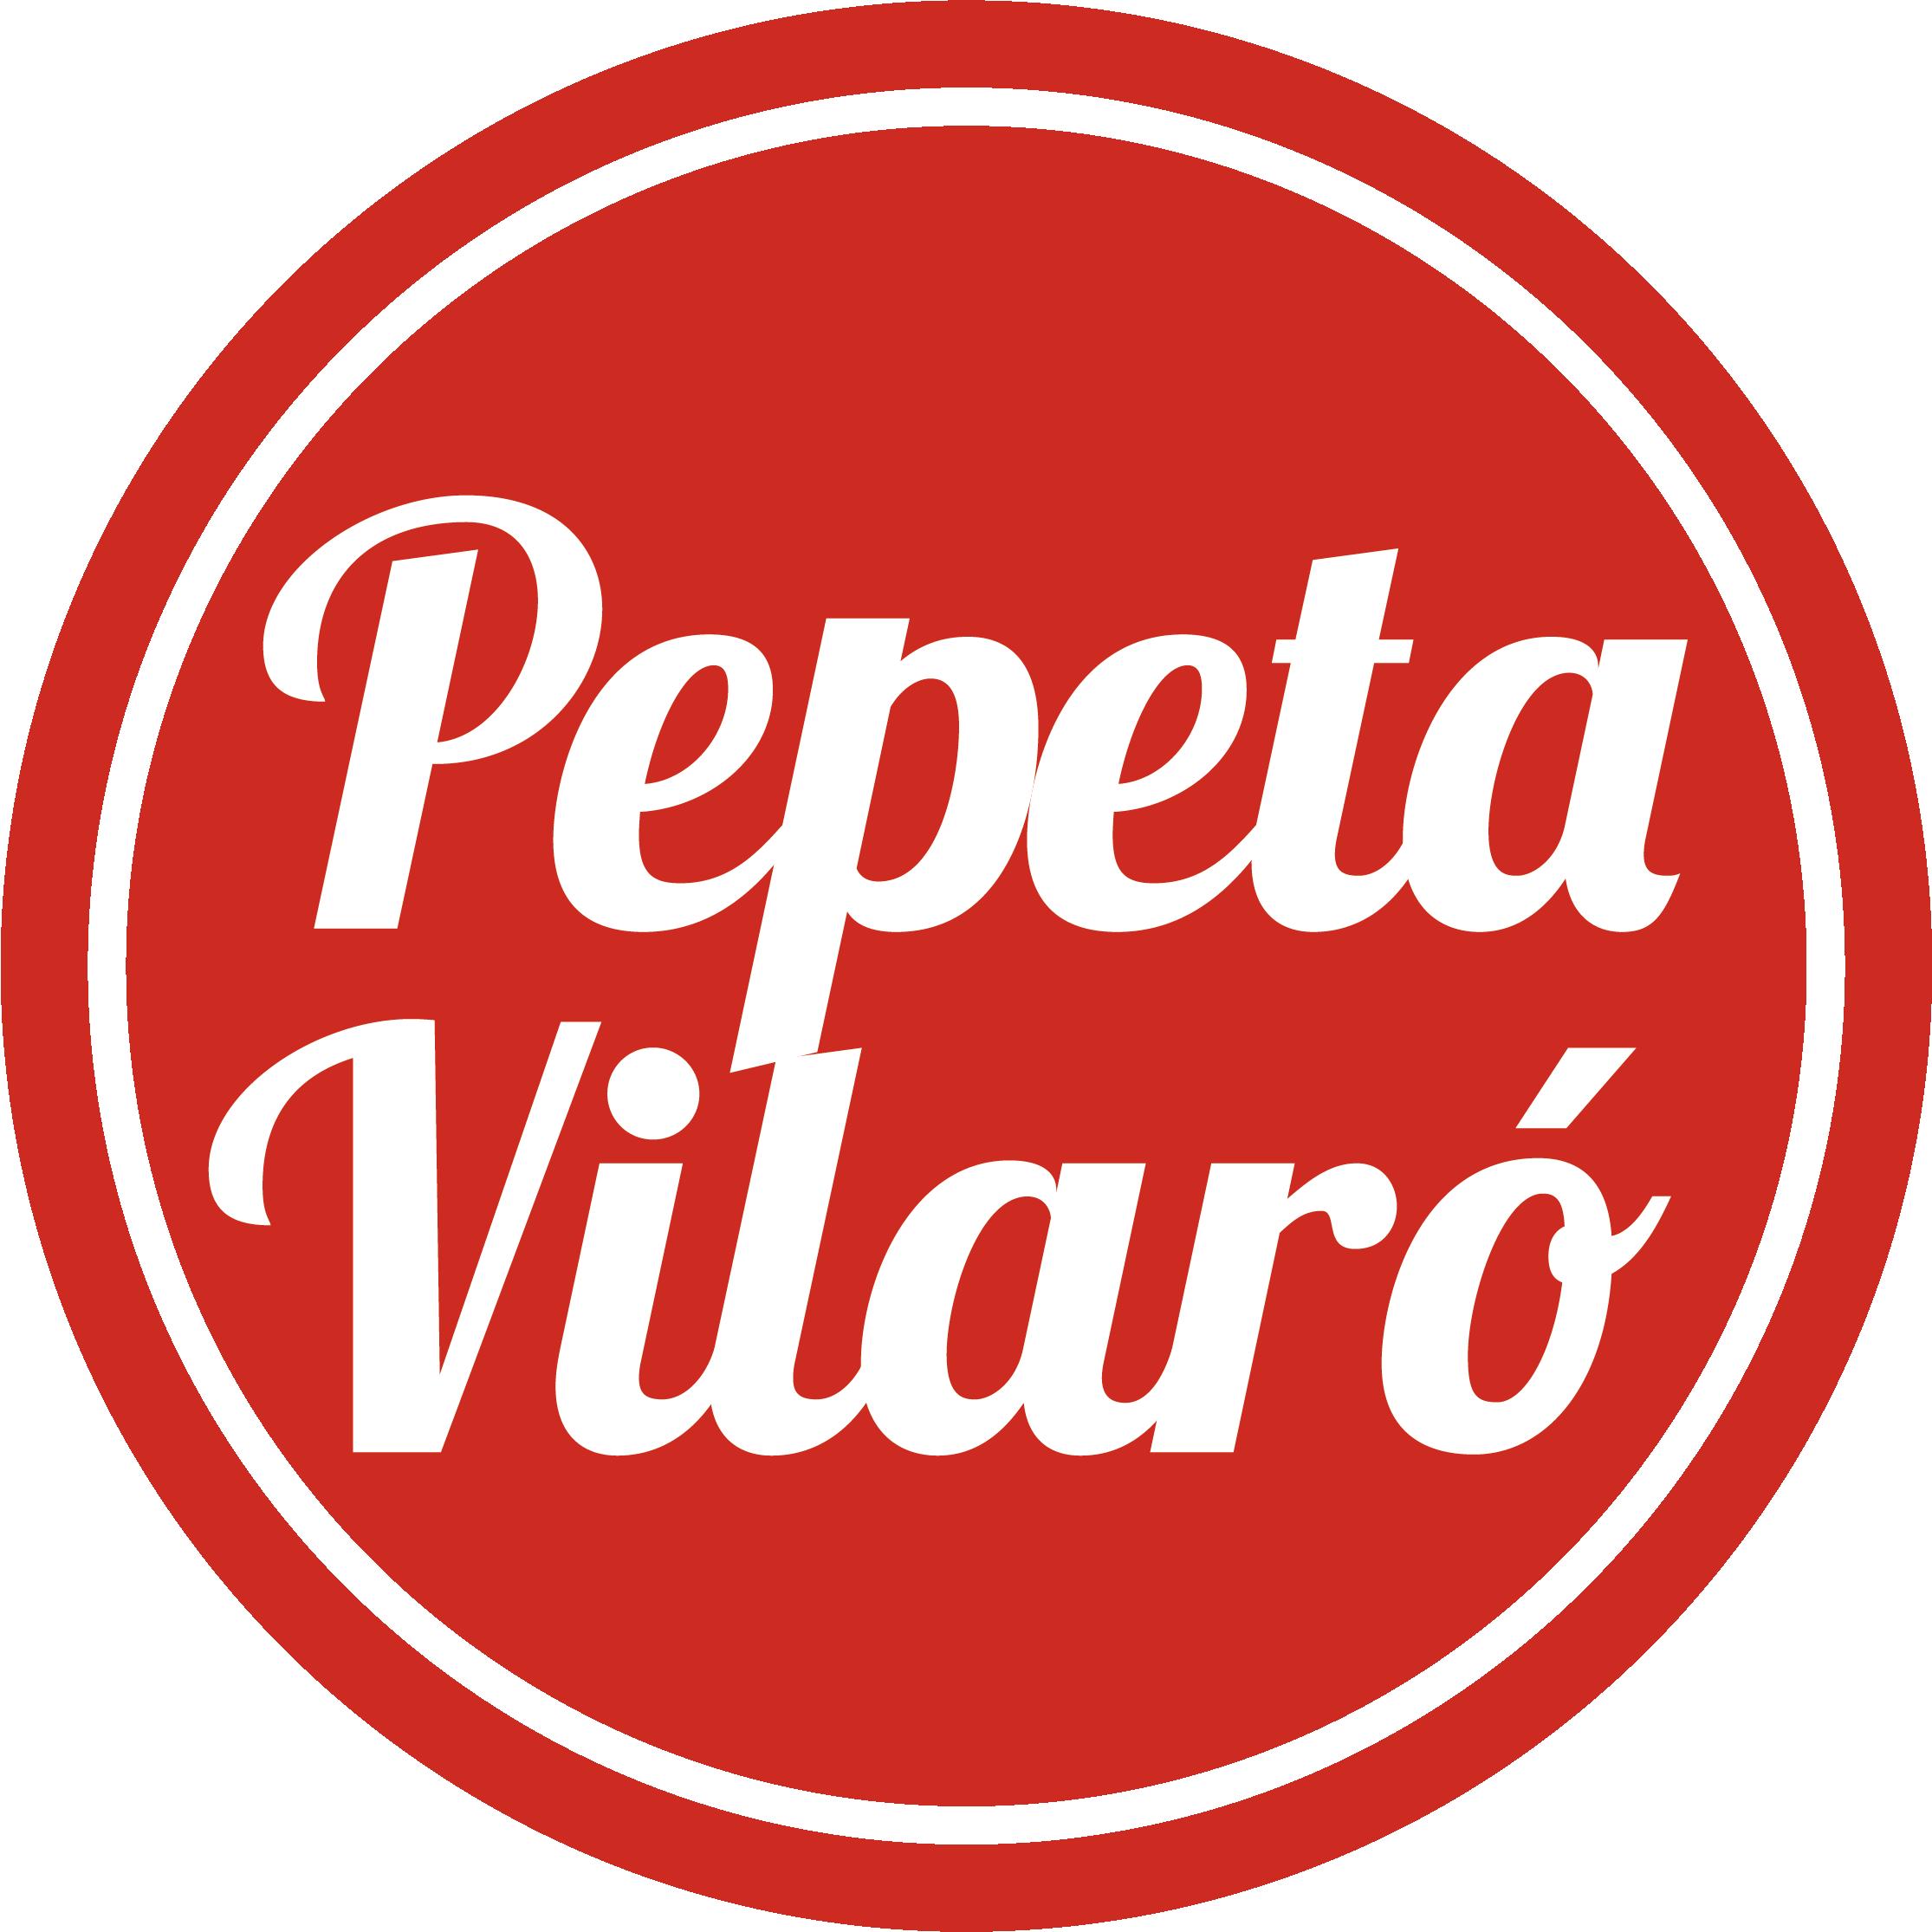 Pepeta Vilaró